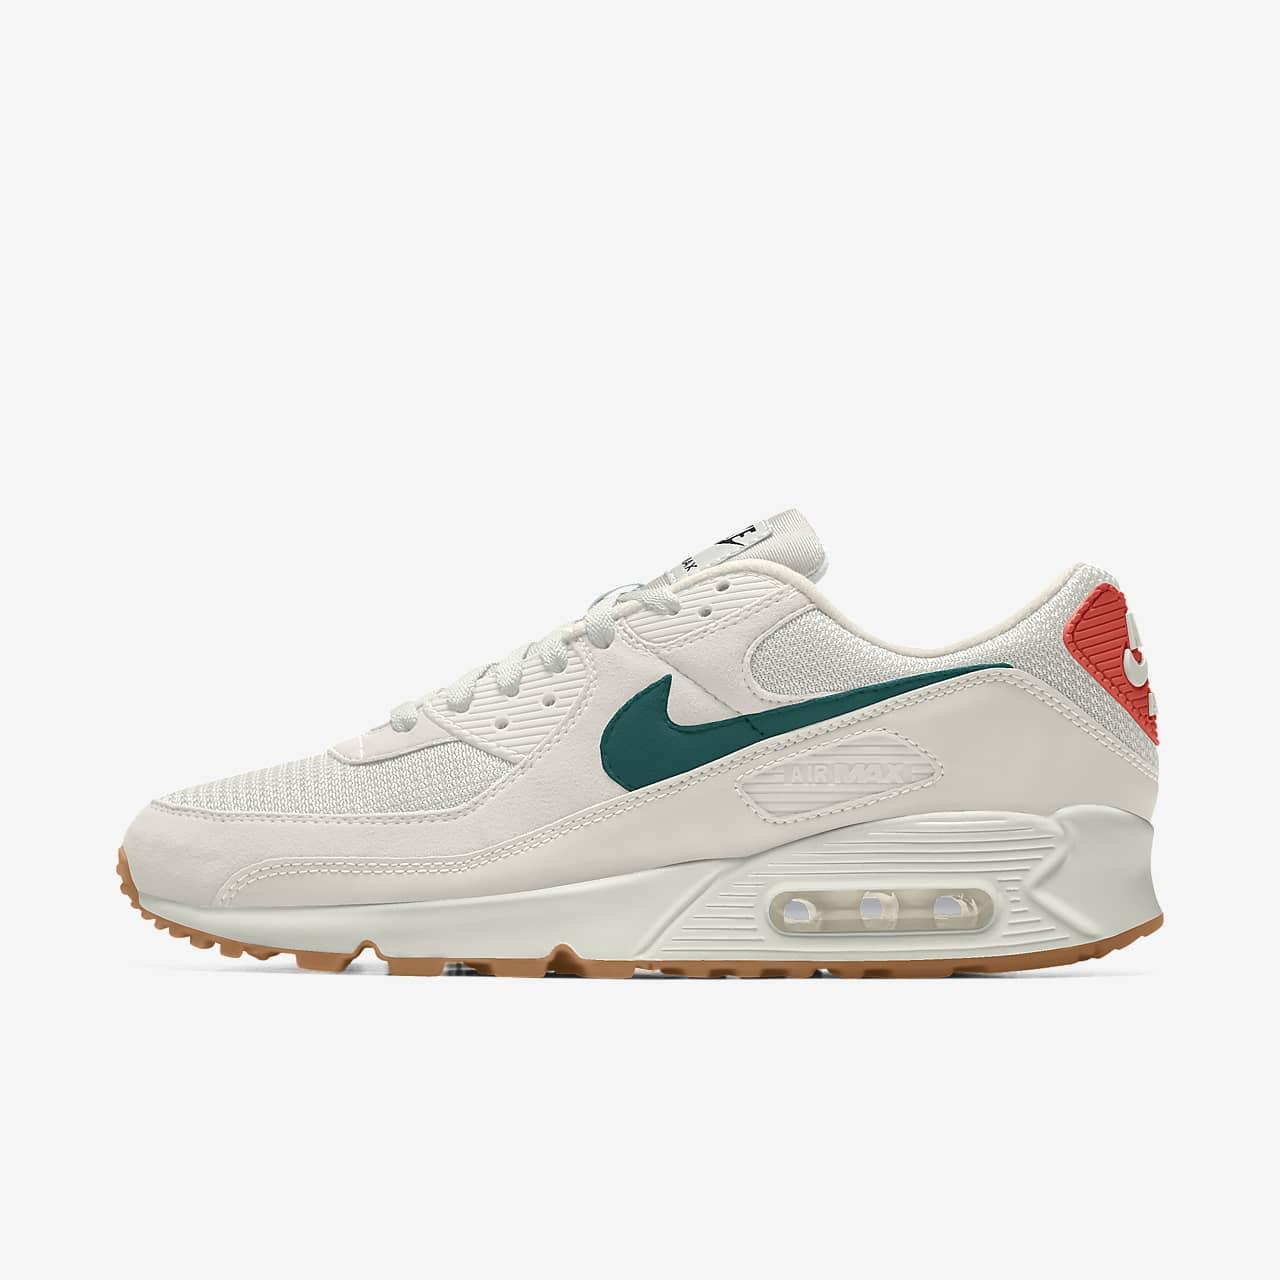 Nike Air Max 90 By You 專屬訂製女鞋